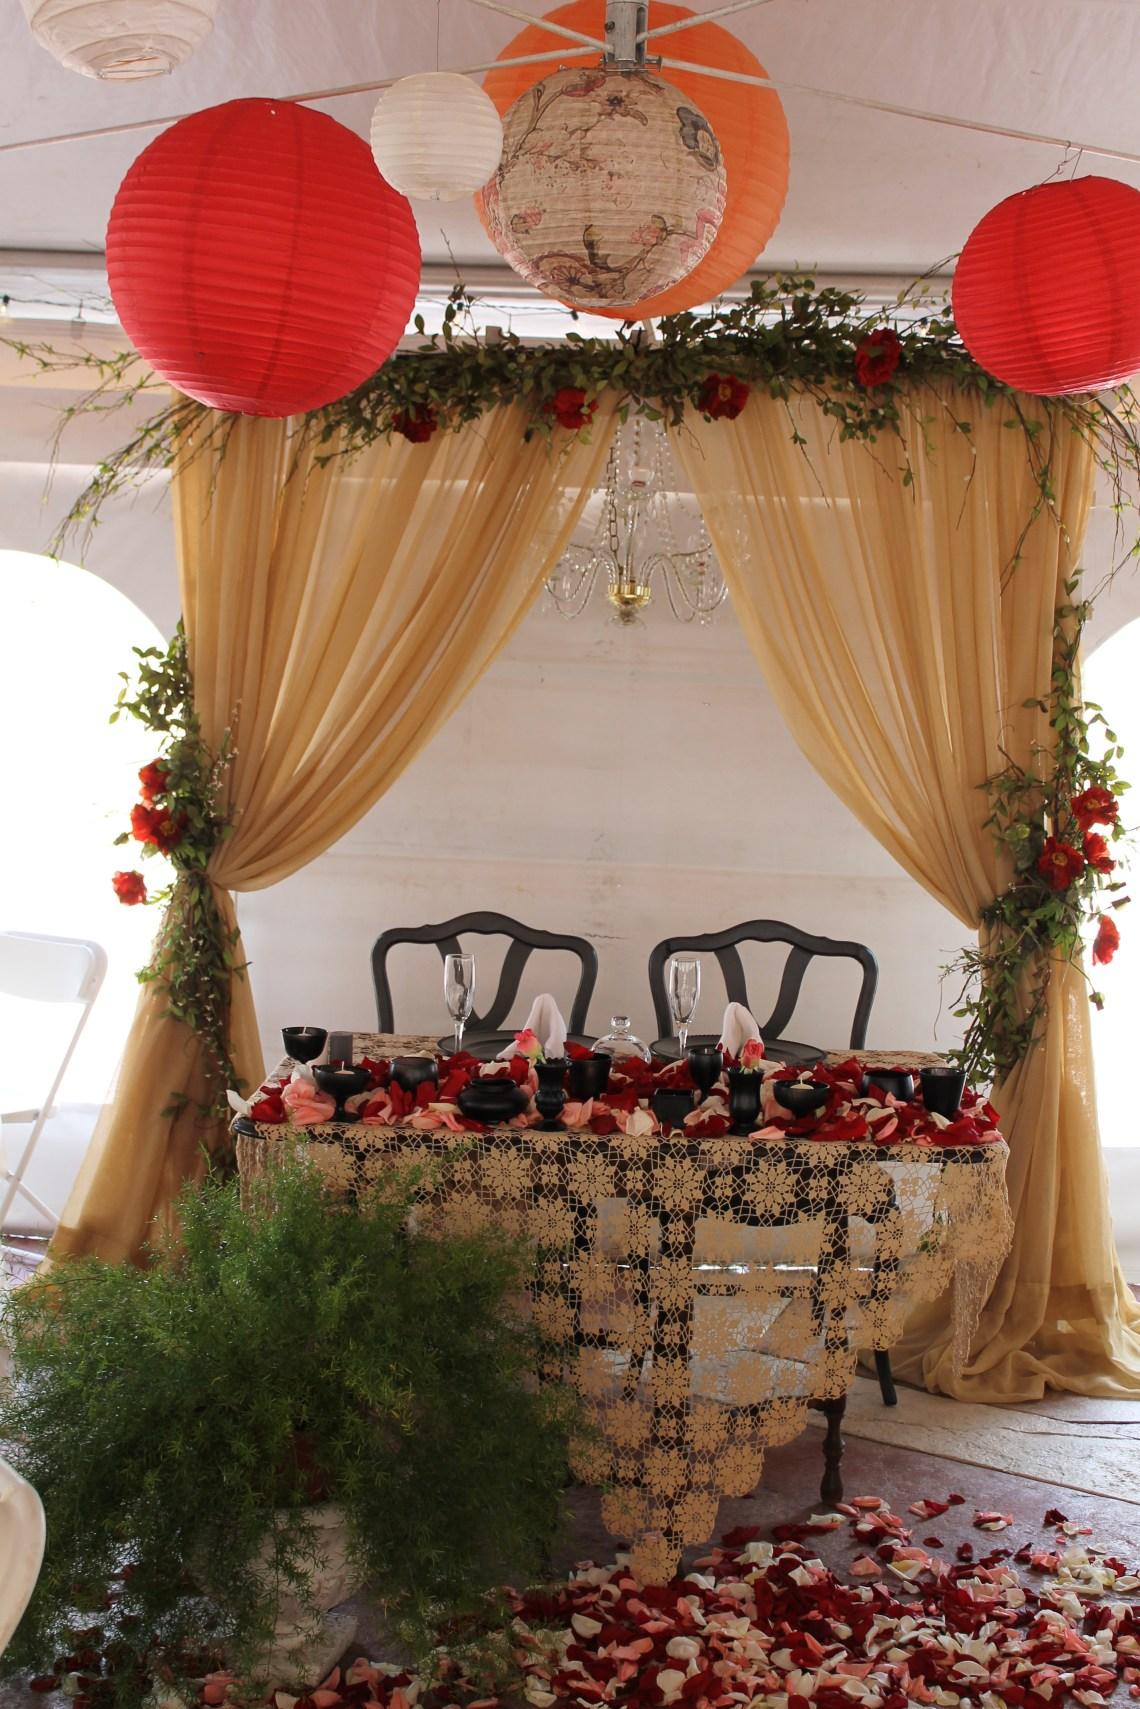 Inside Decor Rental Inc - Dubuque IA - Rustic Wedding Guide